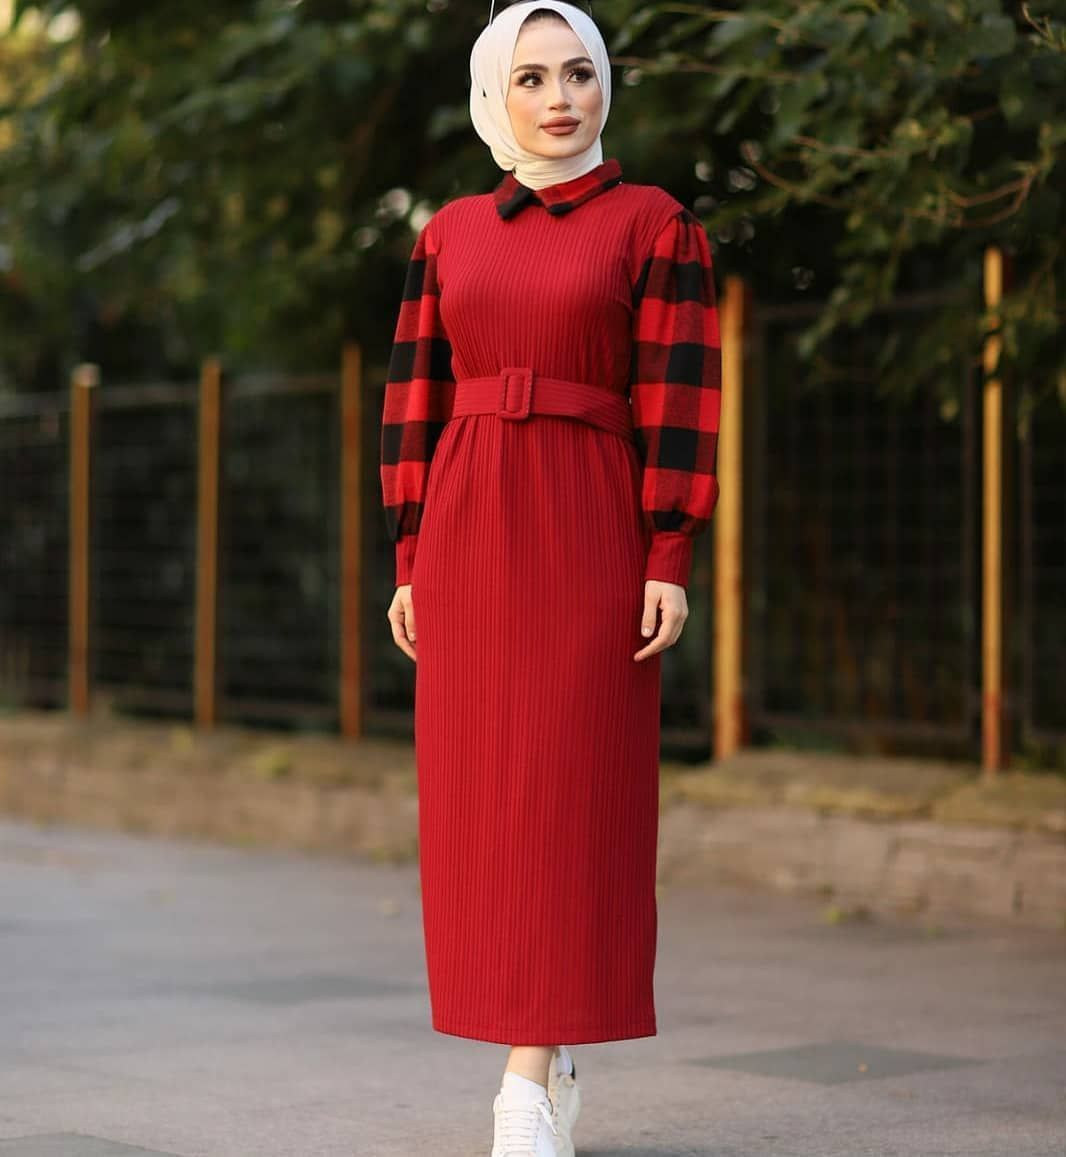 607 Ekoseli Tesettur Elbise 36 38 40 42 44 46 Beden Kumas Ozelligi Birinc Tesettur Triko Modelleri 2020 Fashion Trendy Hijab